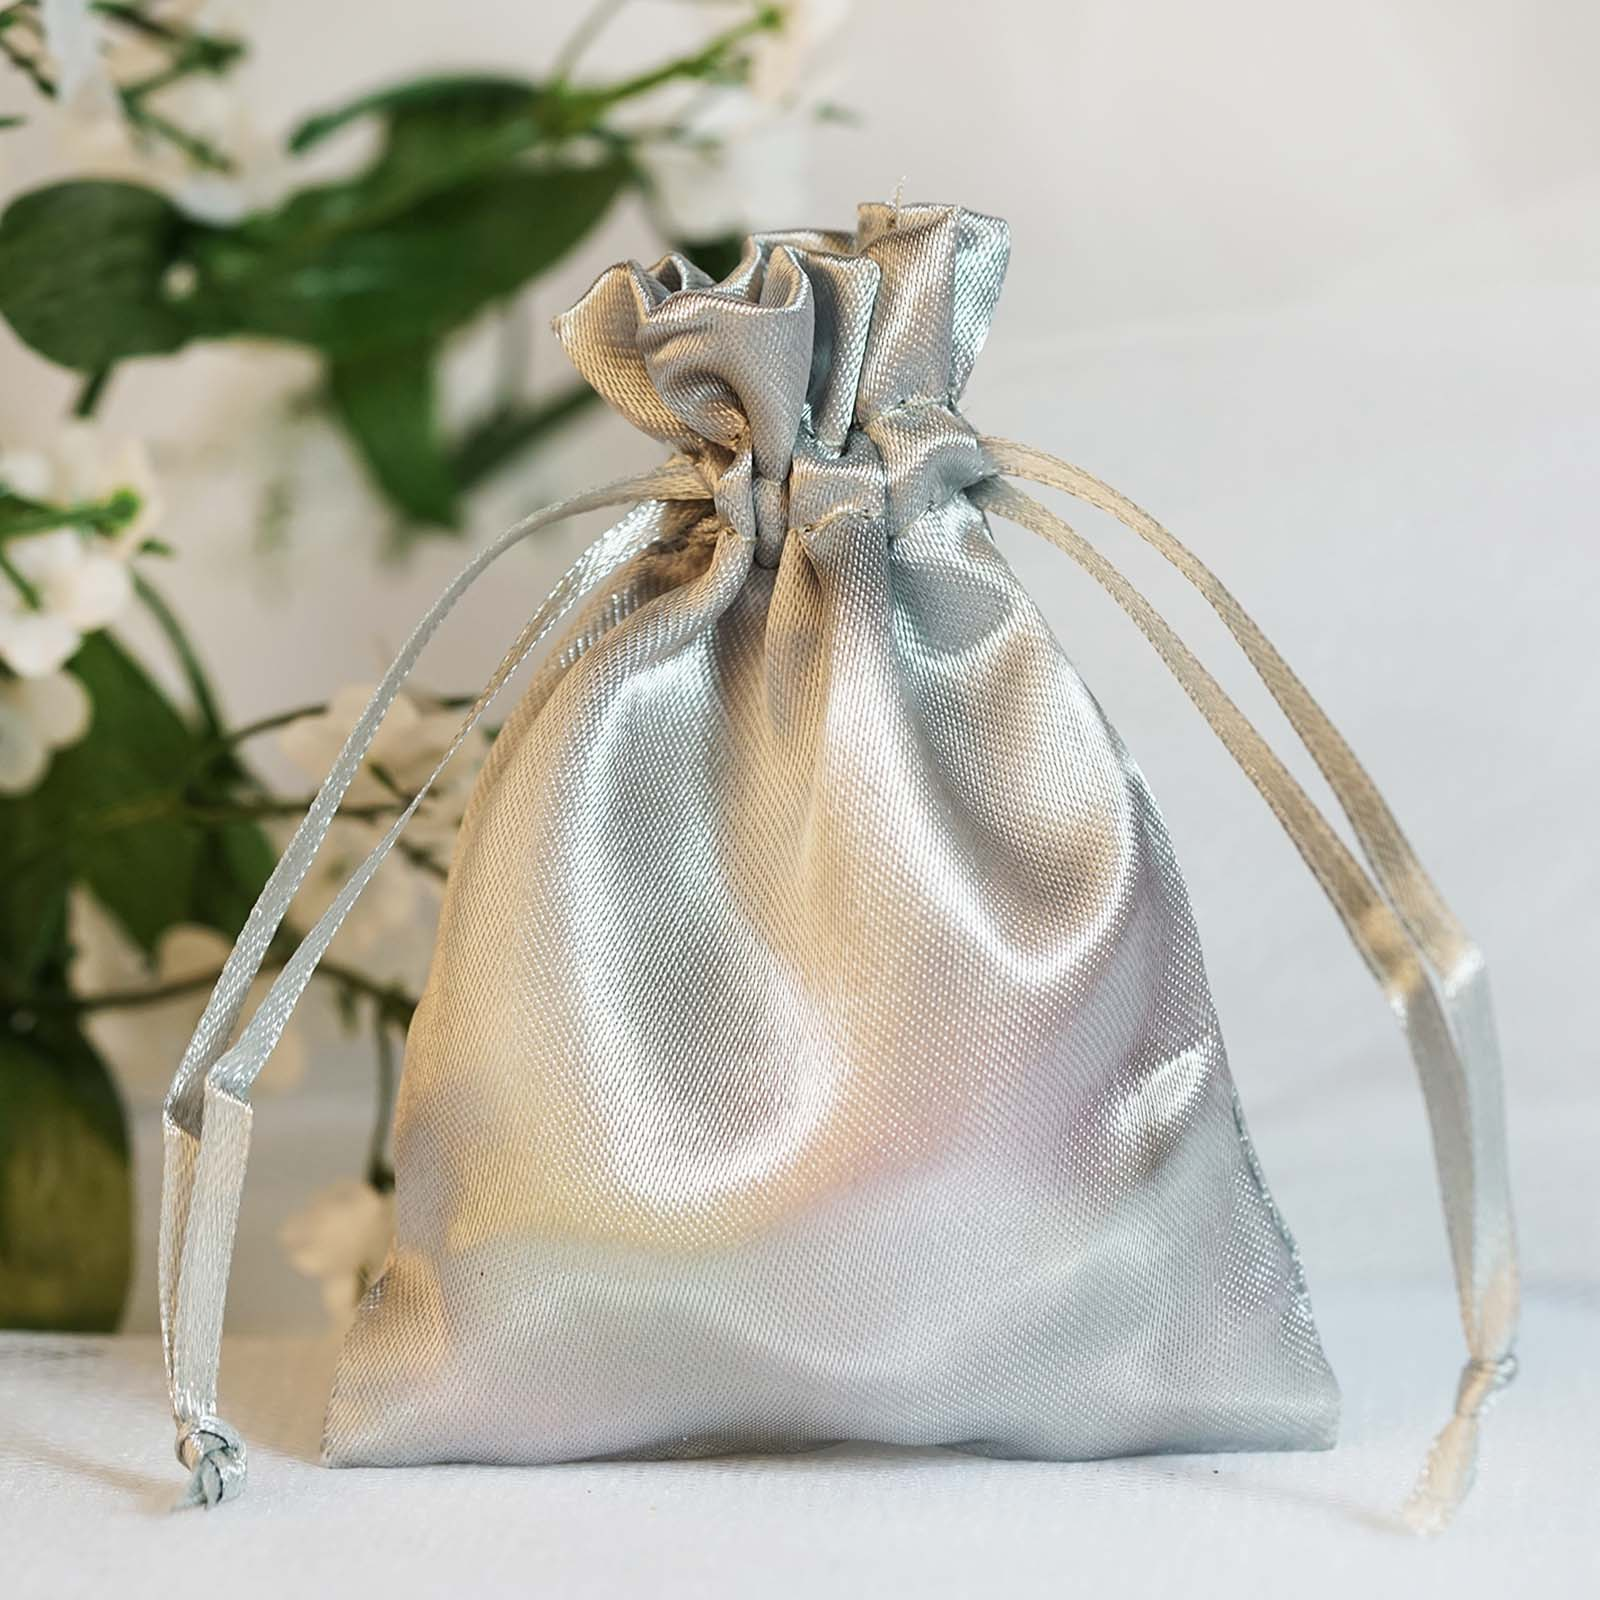 Wedding Favor Net Bags : ... SATIN FAVOR BAGS Wedding Party Reception Gift Favors WHOLESALE eBay